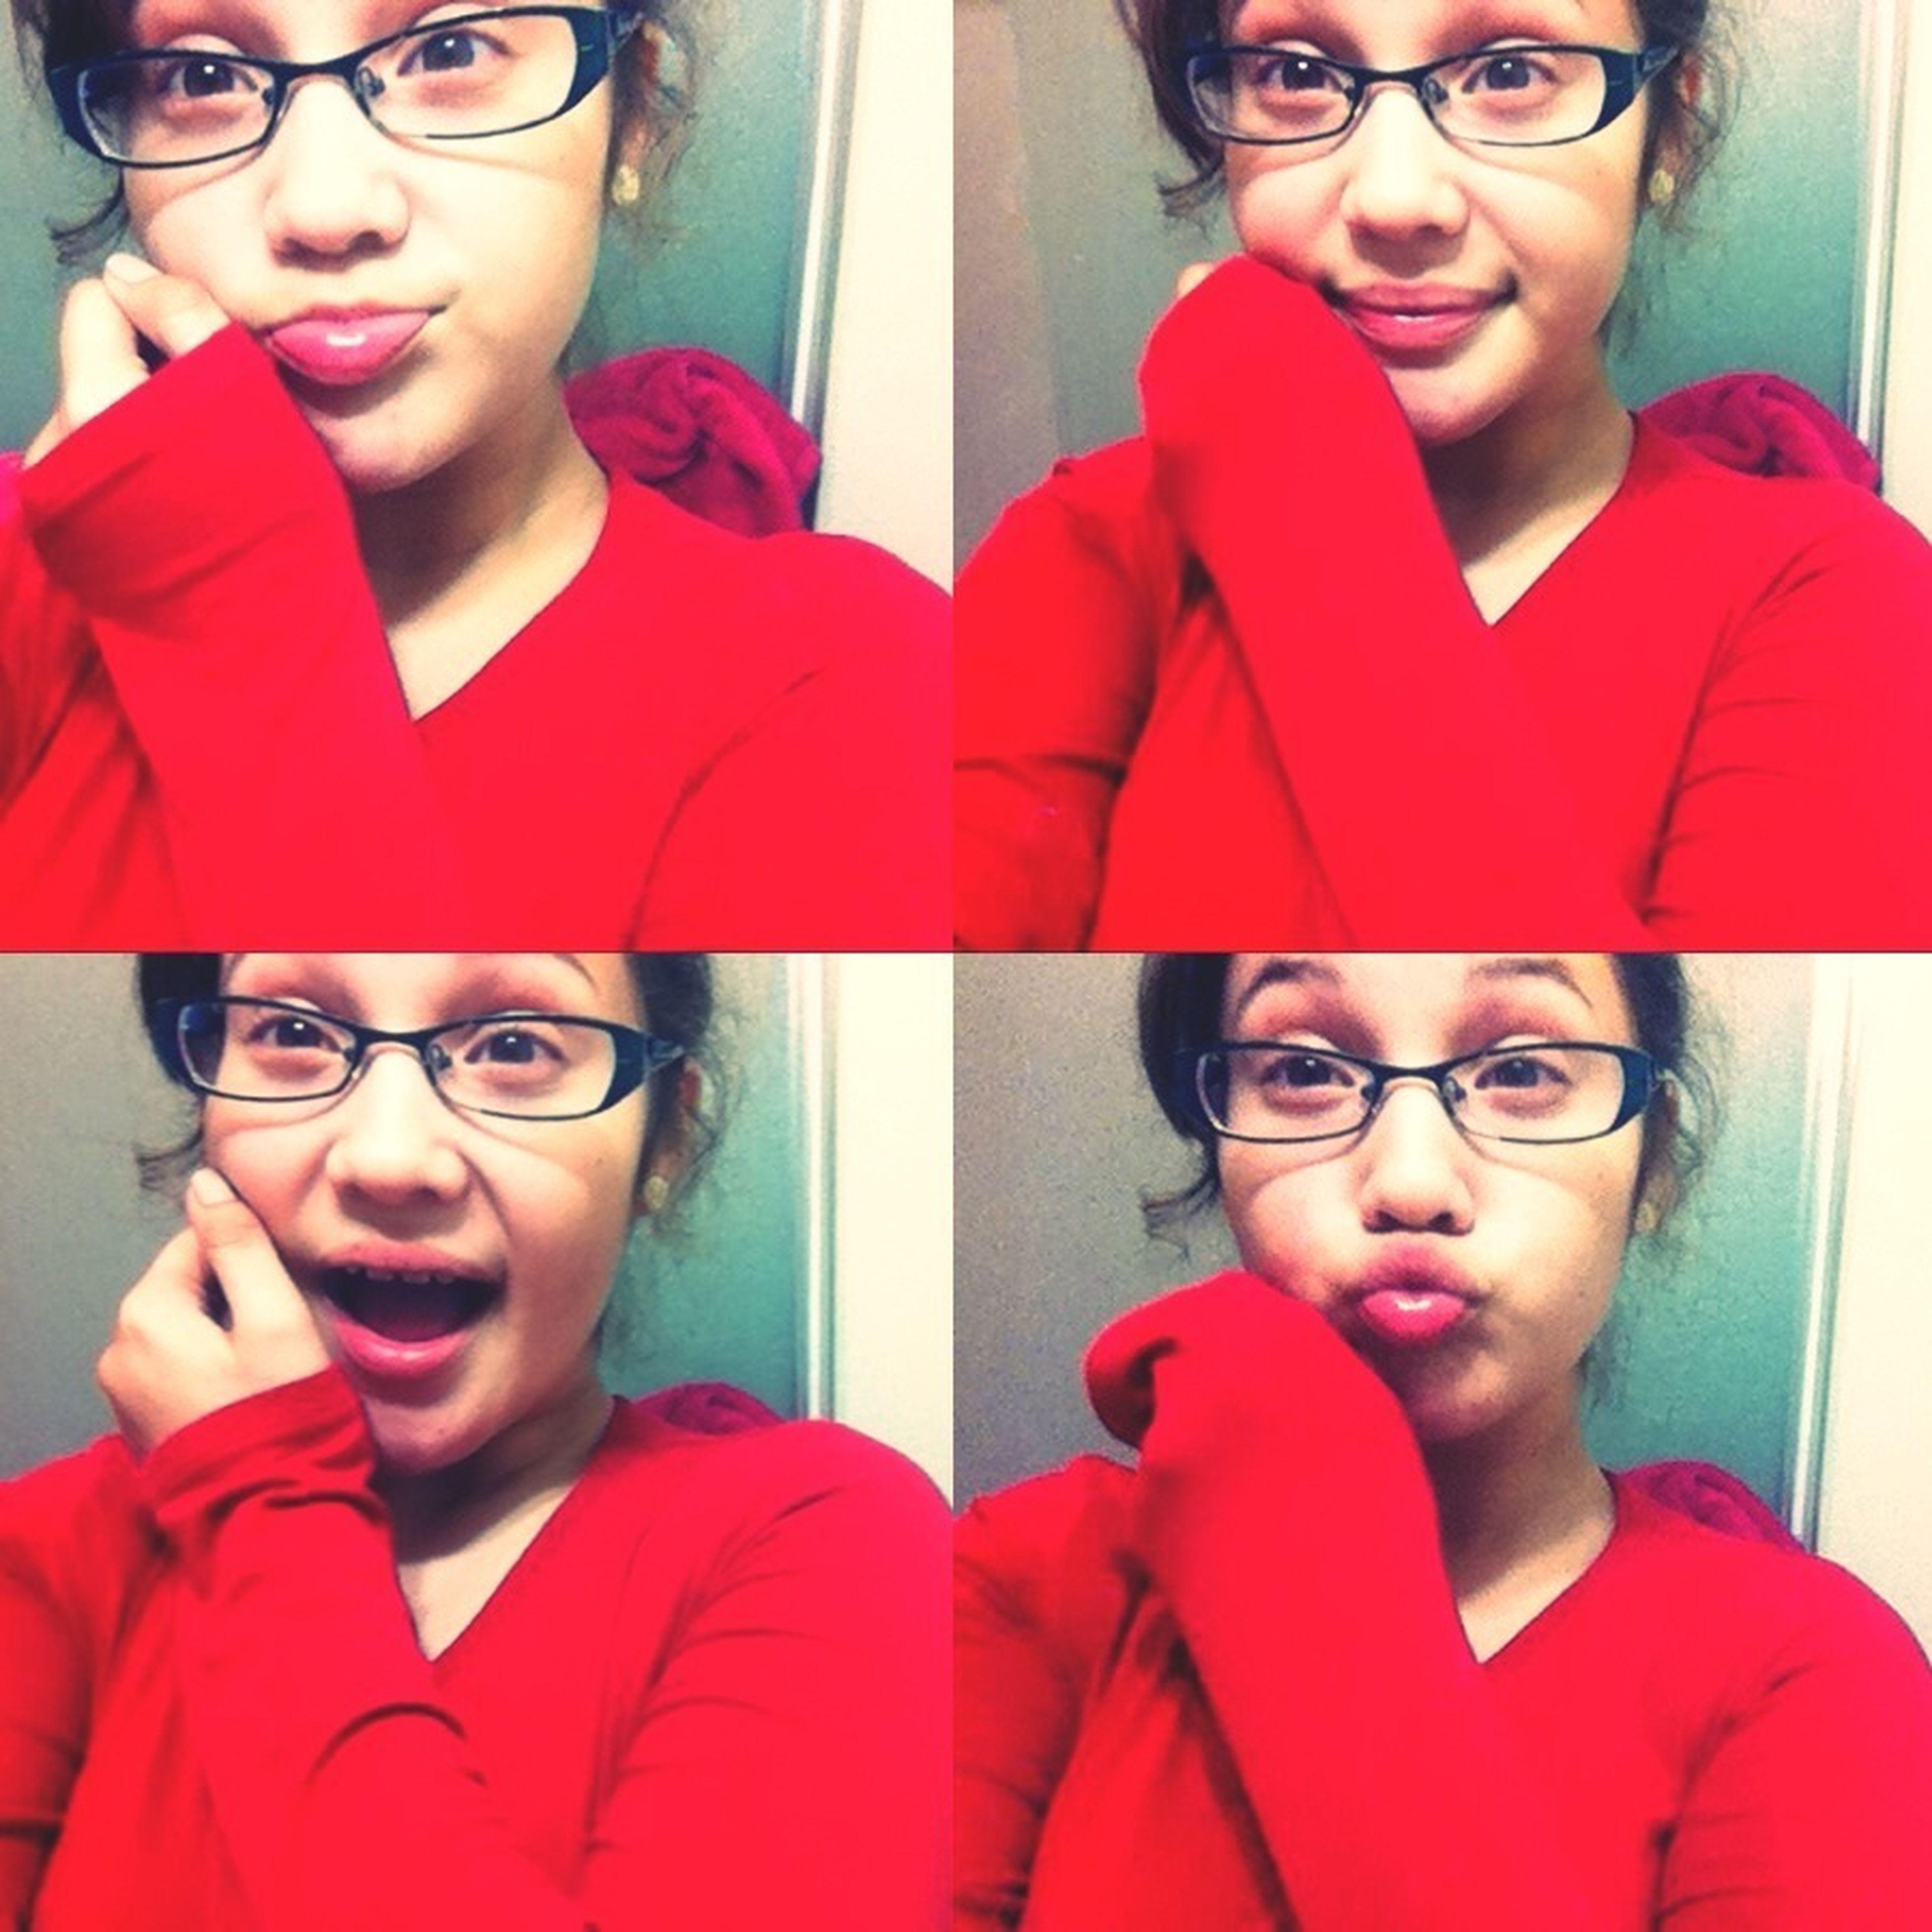 im cuteee c: lol merry christmas eve ^-^